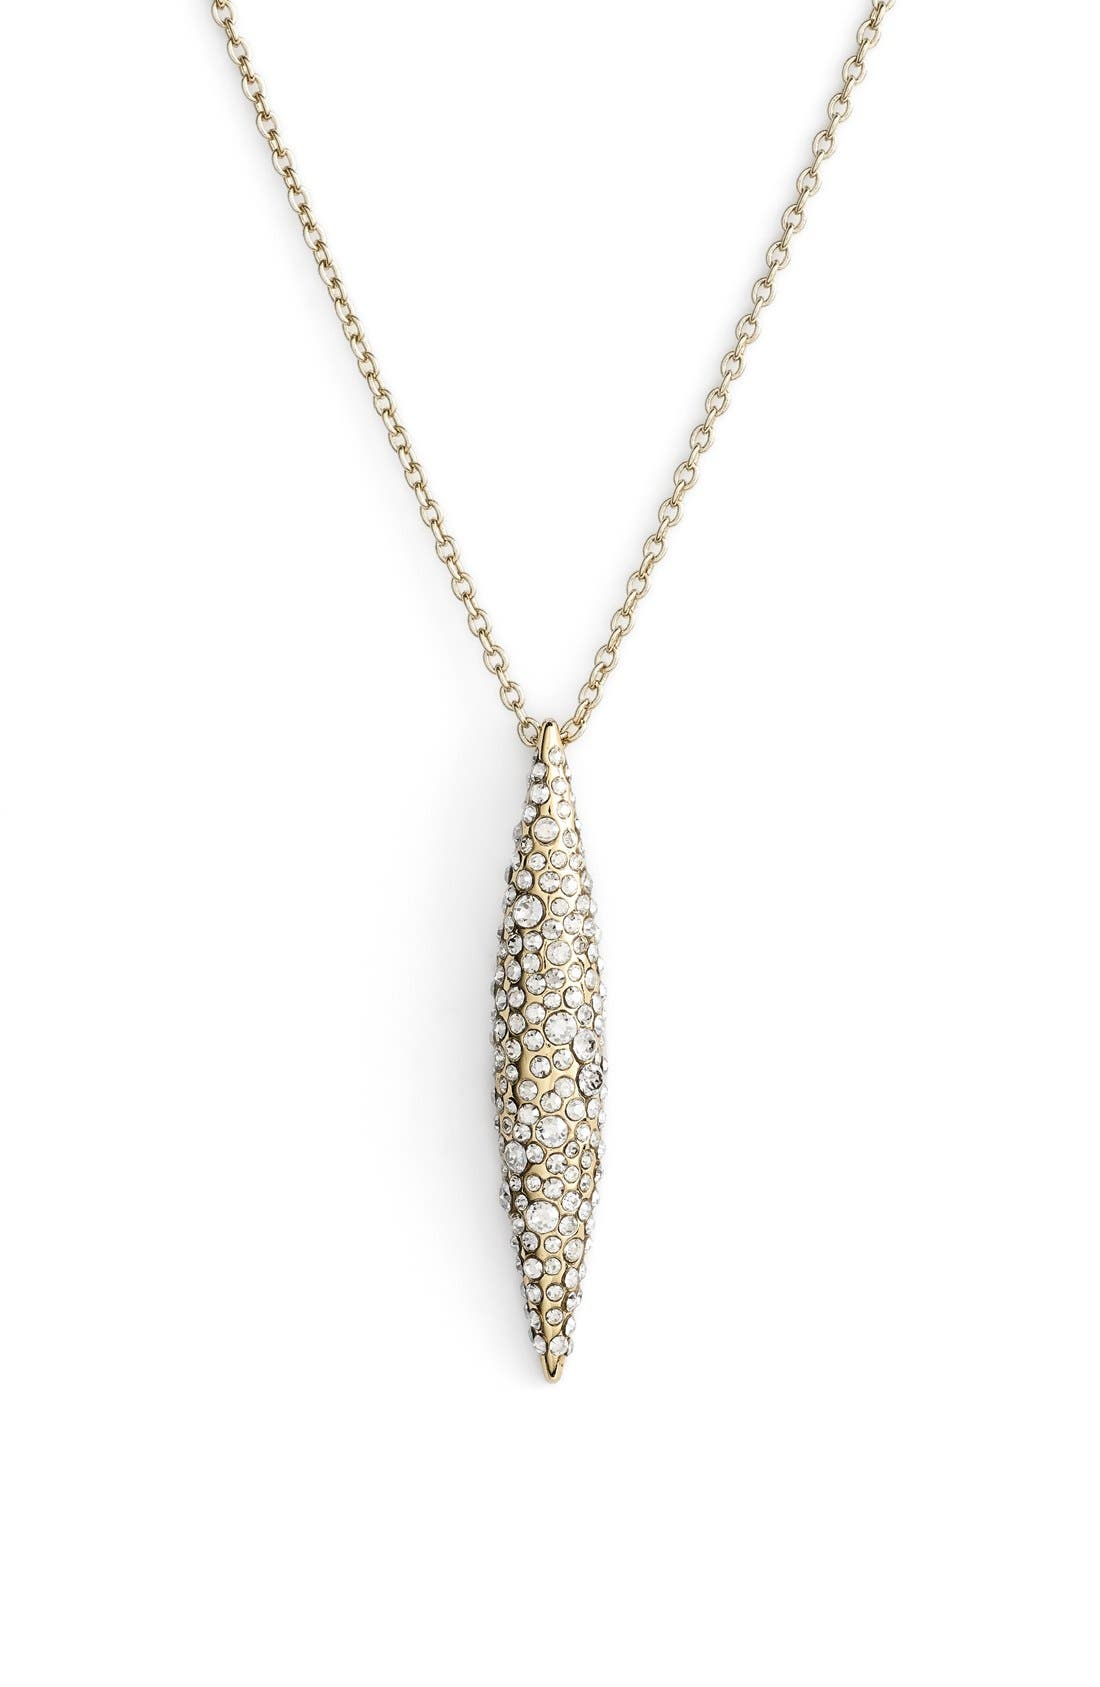 Main Image - Alexis Bittar 'Miss Havisham' Crystal Encrusted Spear Pendant Necklace